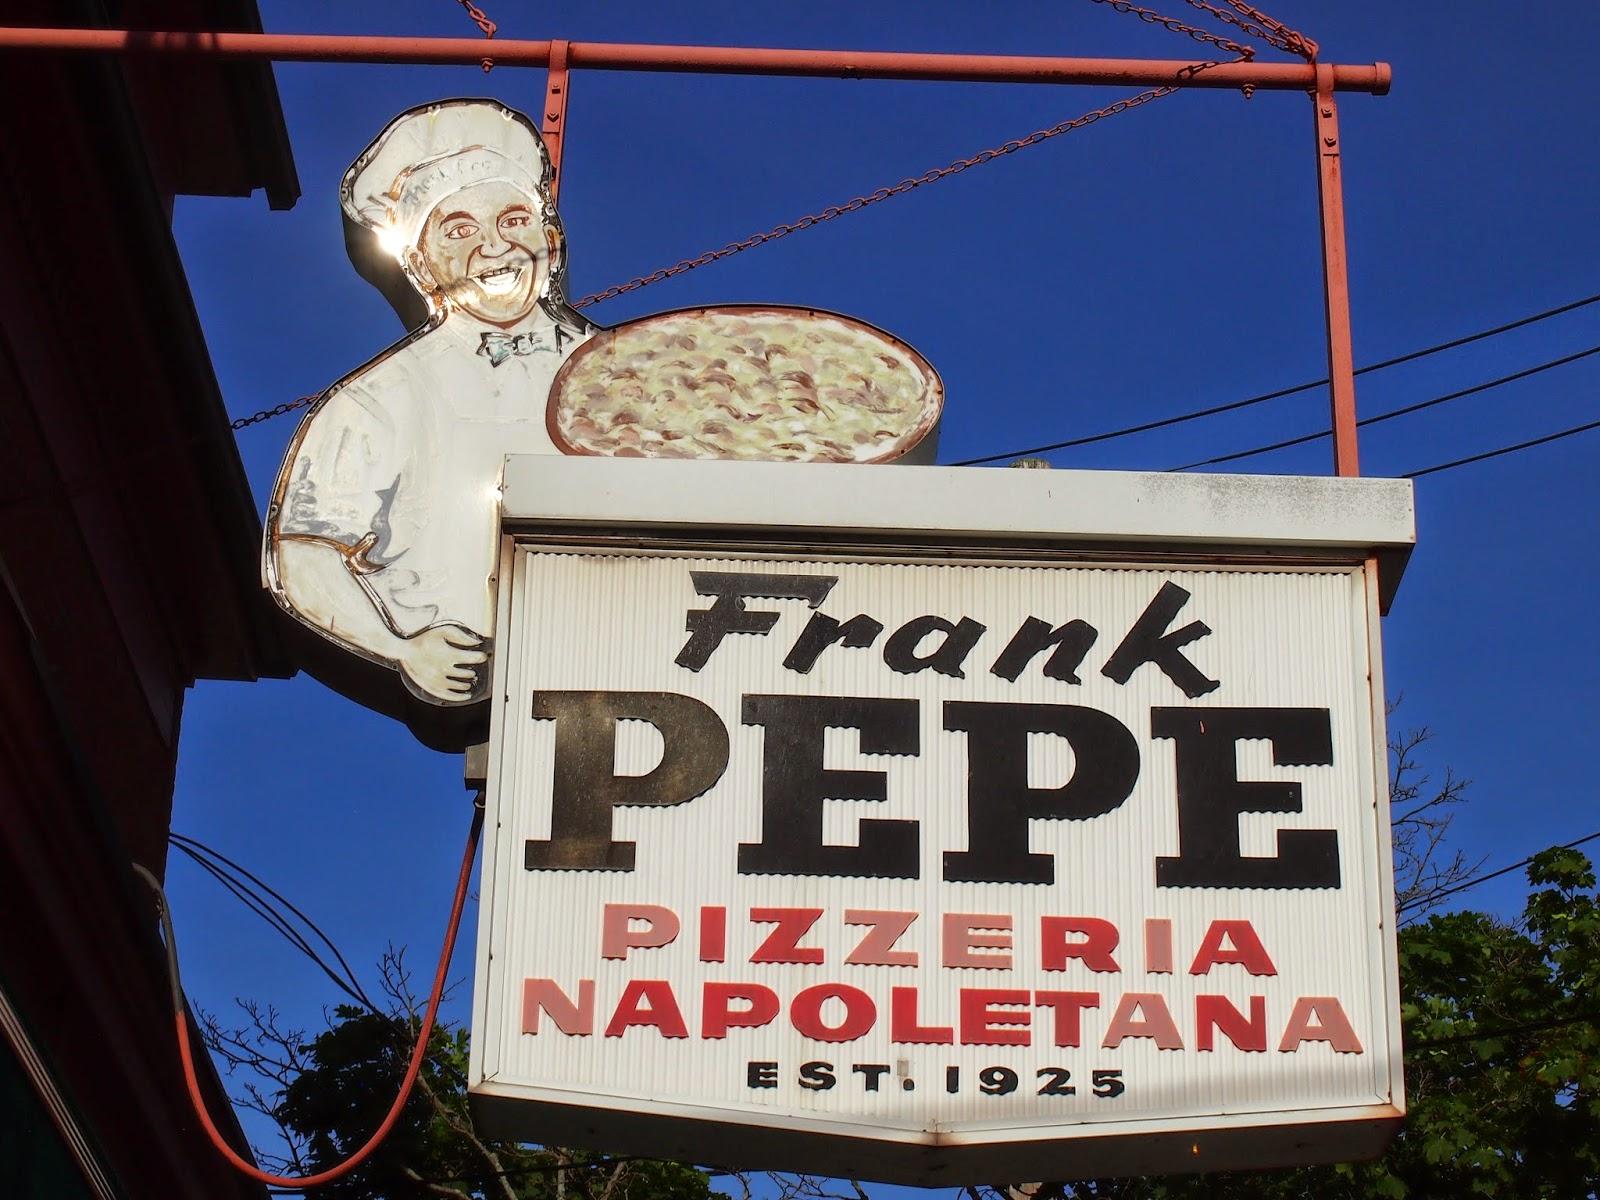 Frank Pepe's Pizzeria